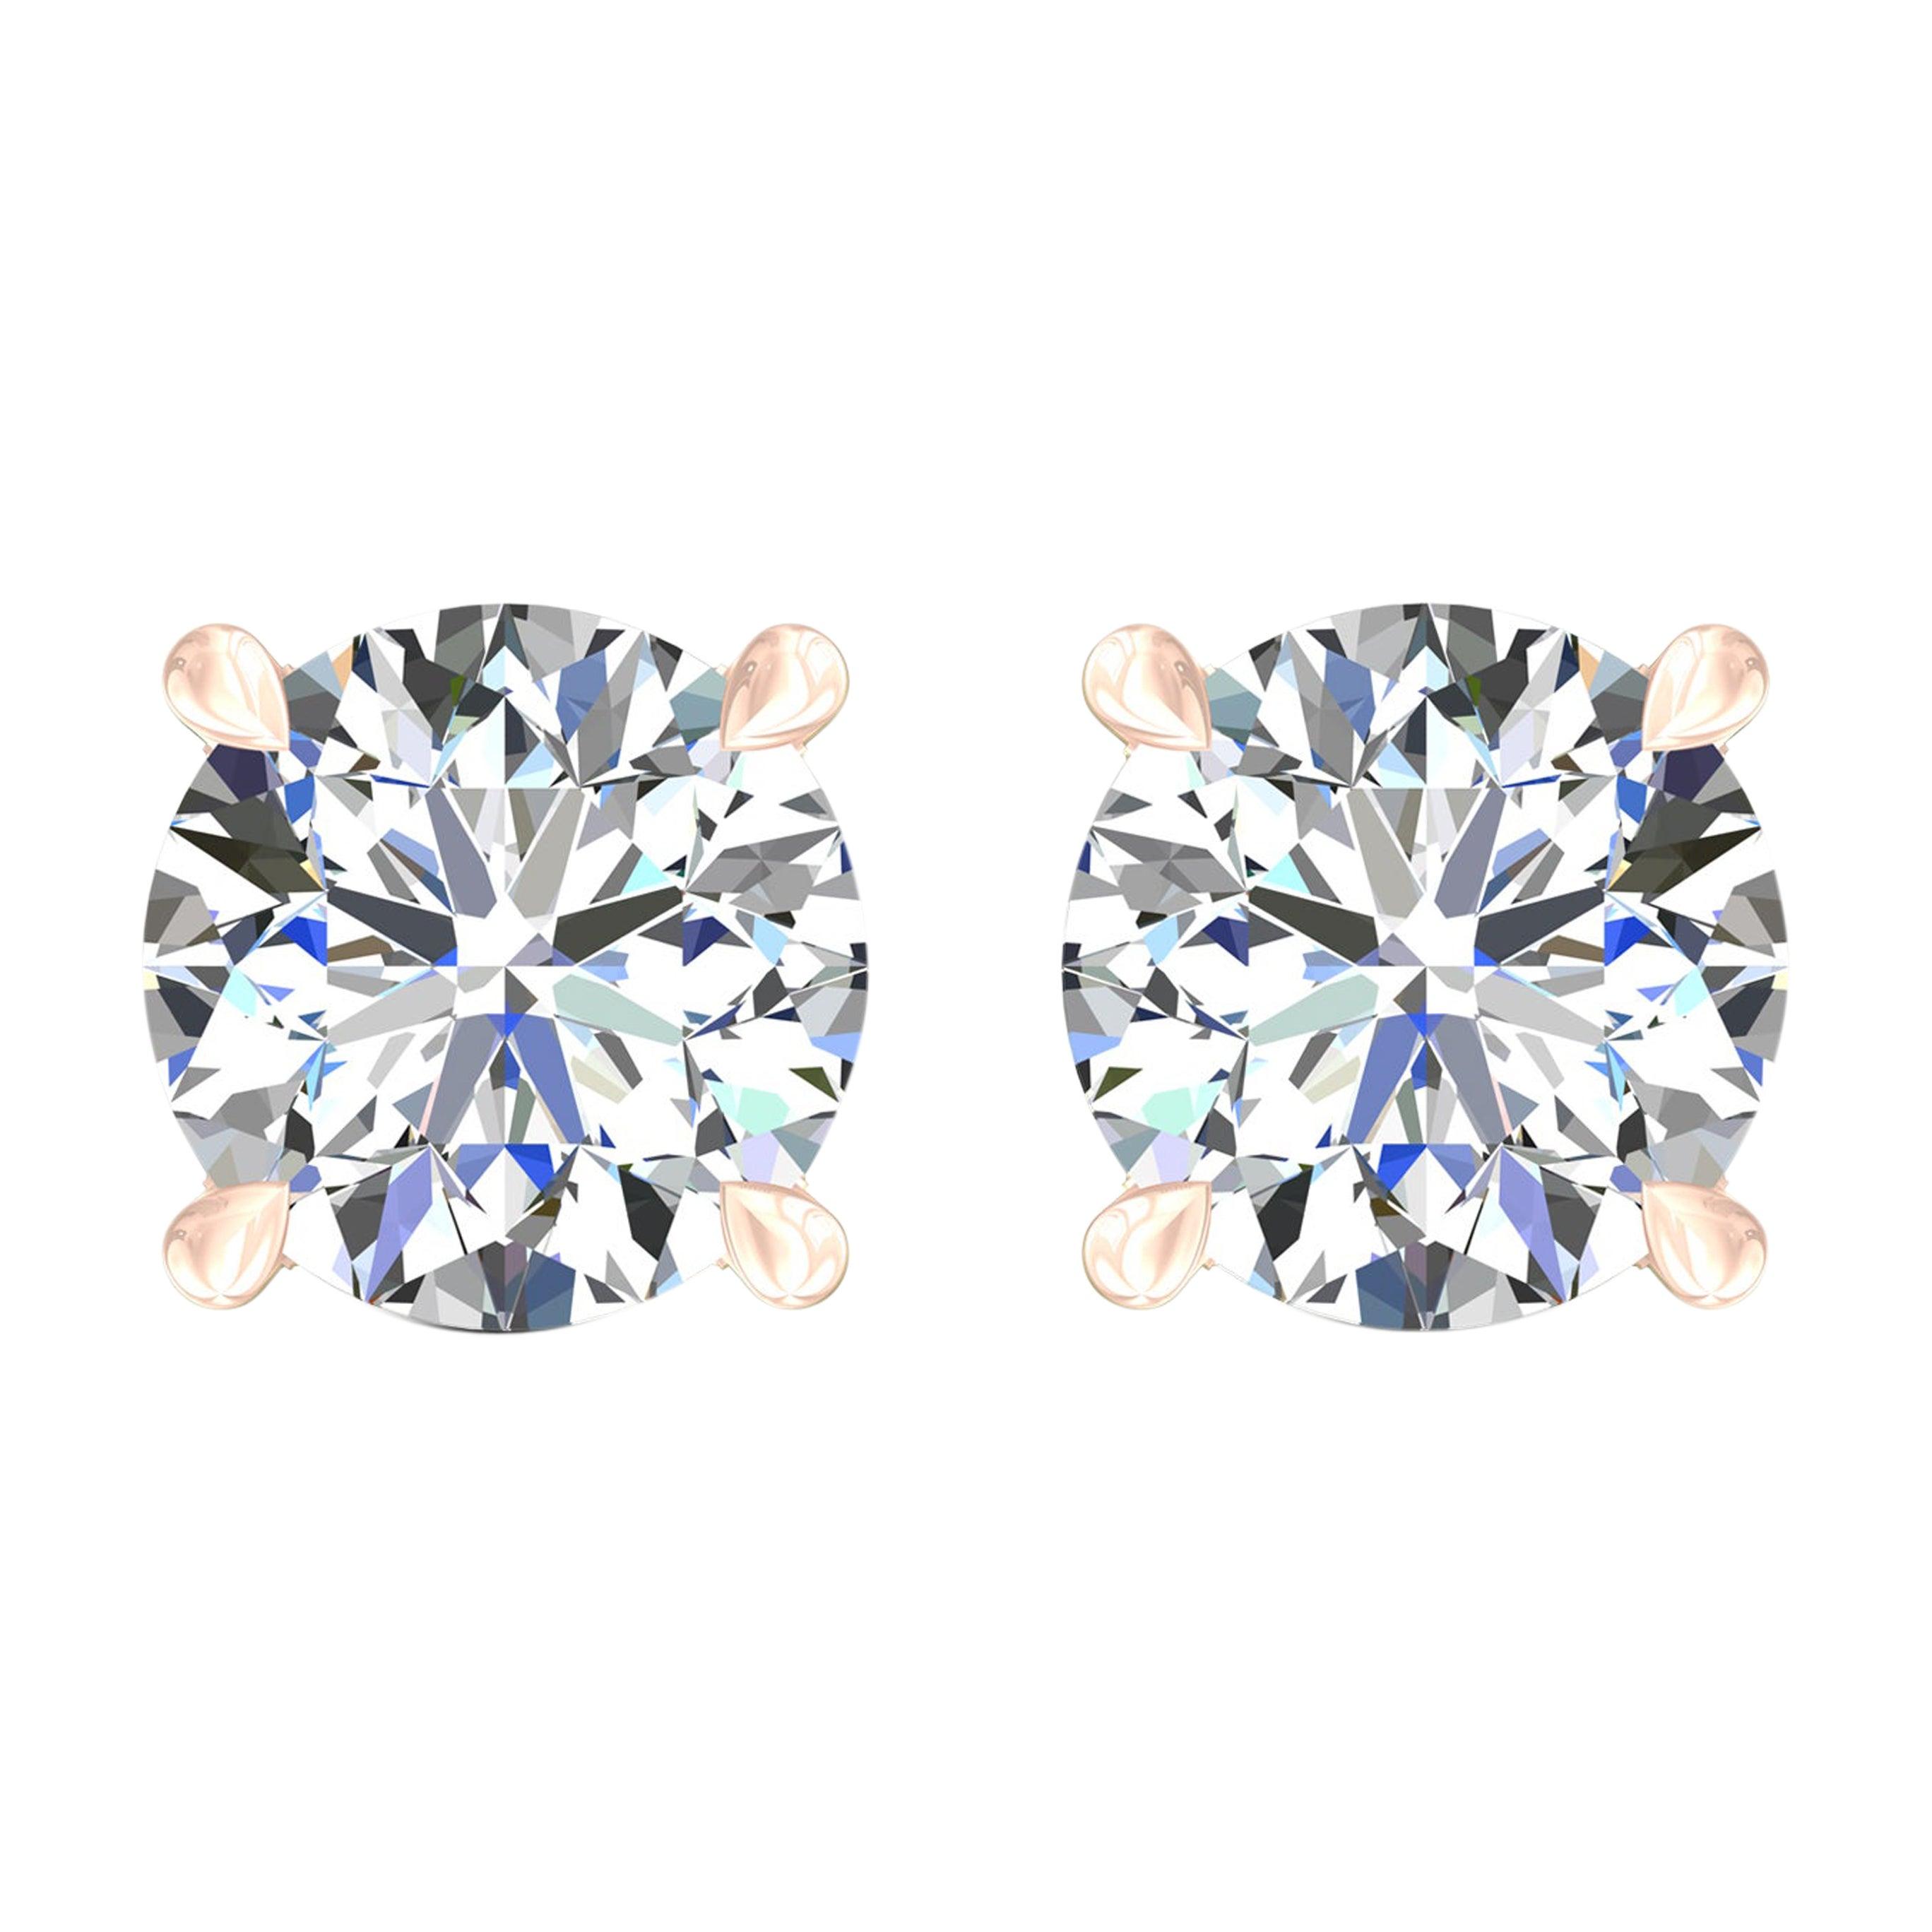 Harakh GIA Certified 0.80 Carat D-E Color VS2 Clarity 18KT Diamond Stud Earrings